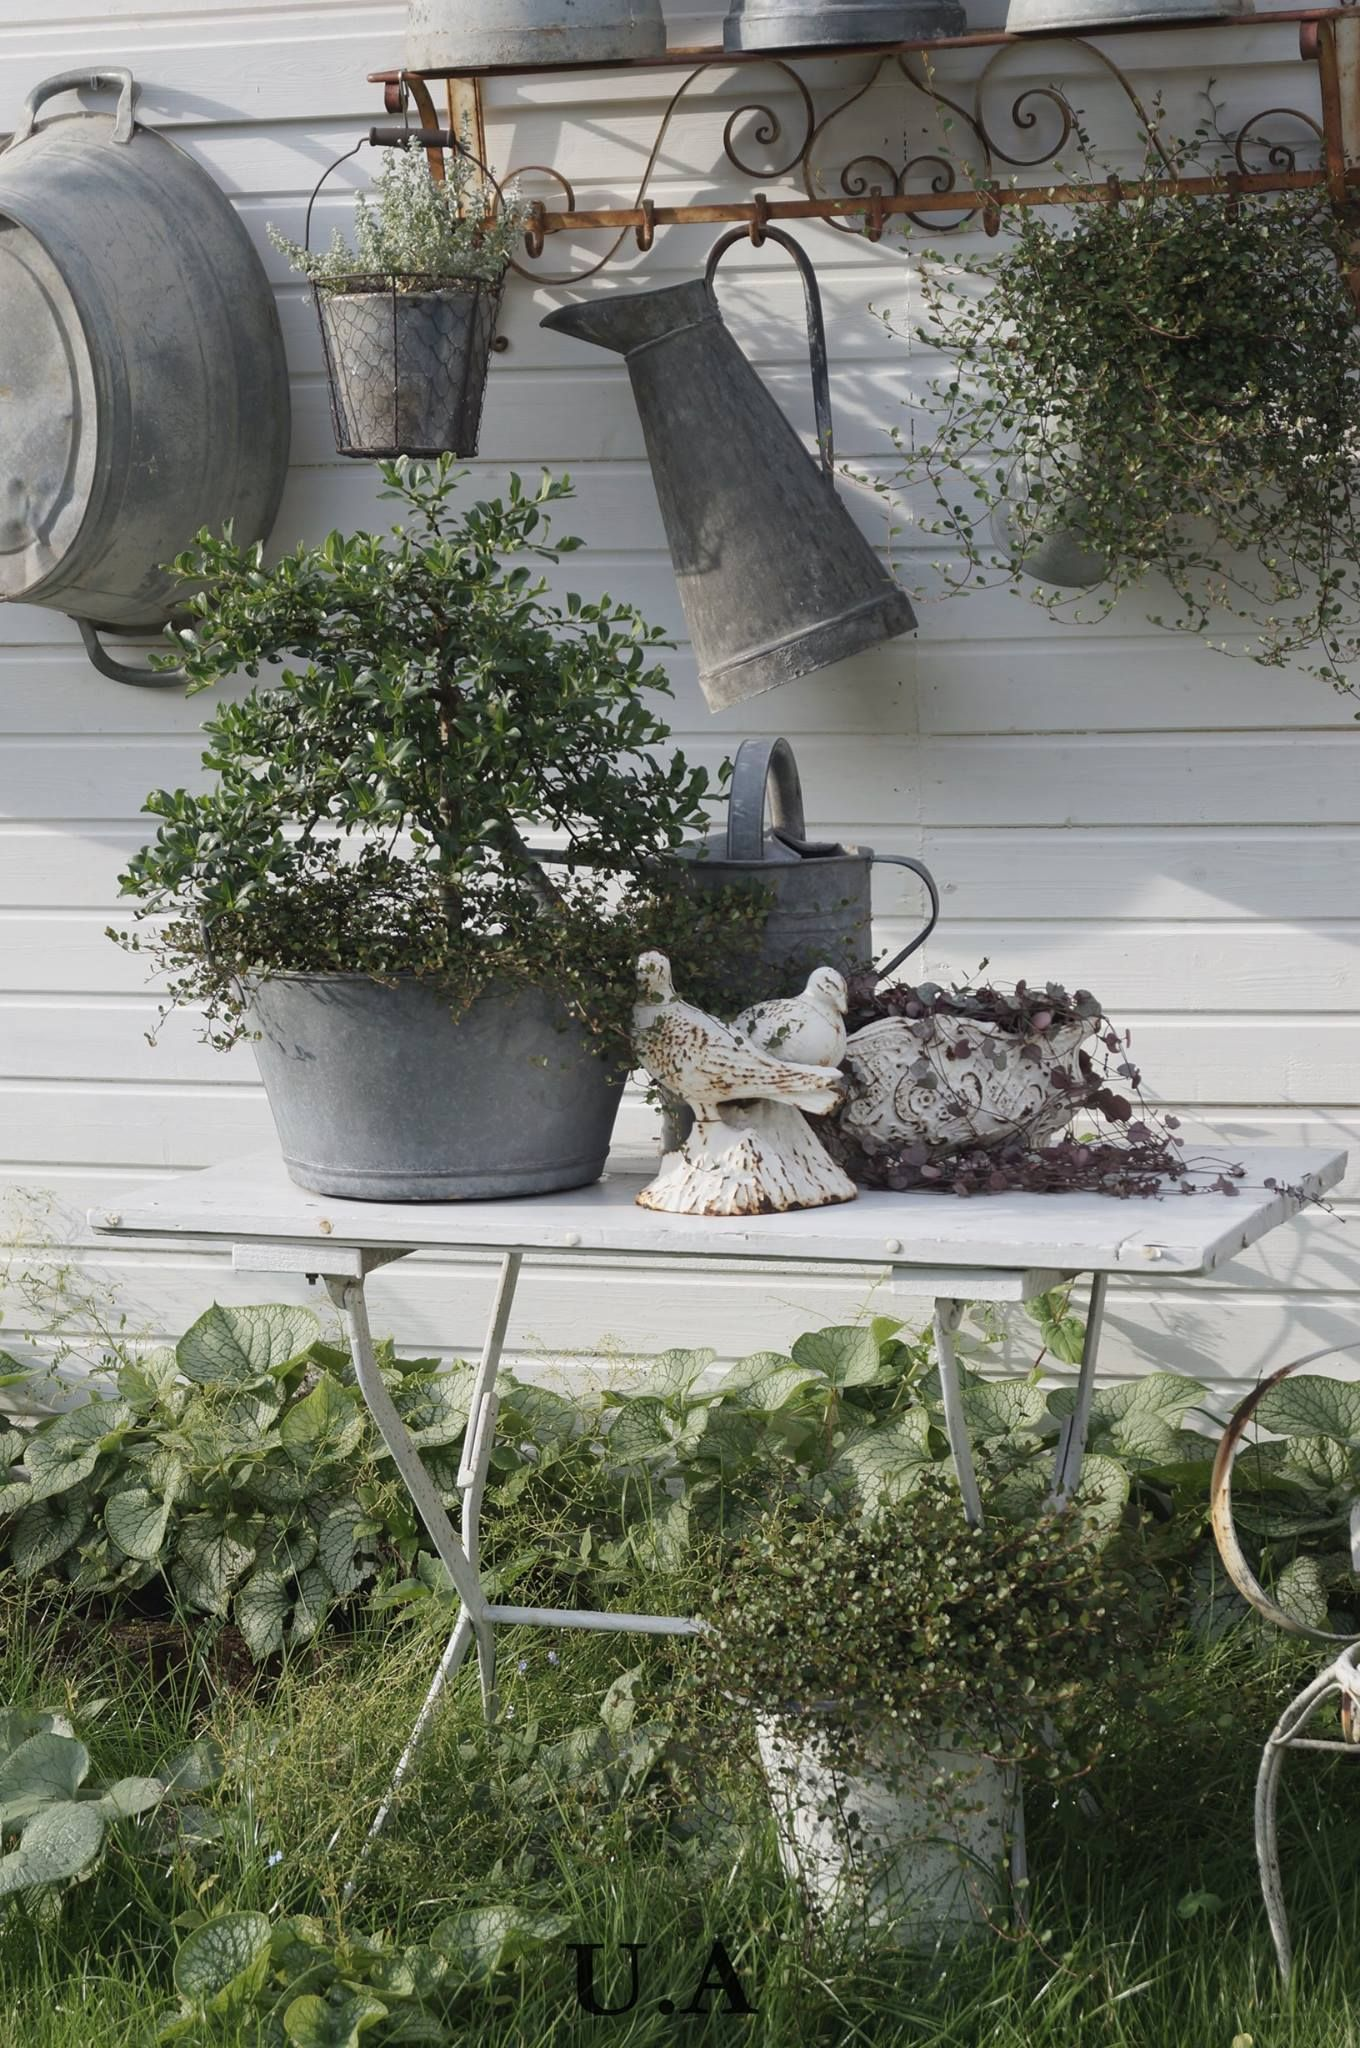 Épinglé par Diana Absil-Bijlmakers sur nice brocante pictures ...